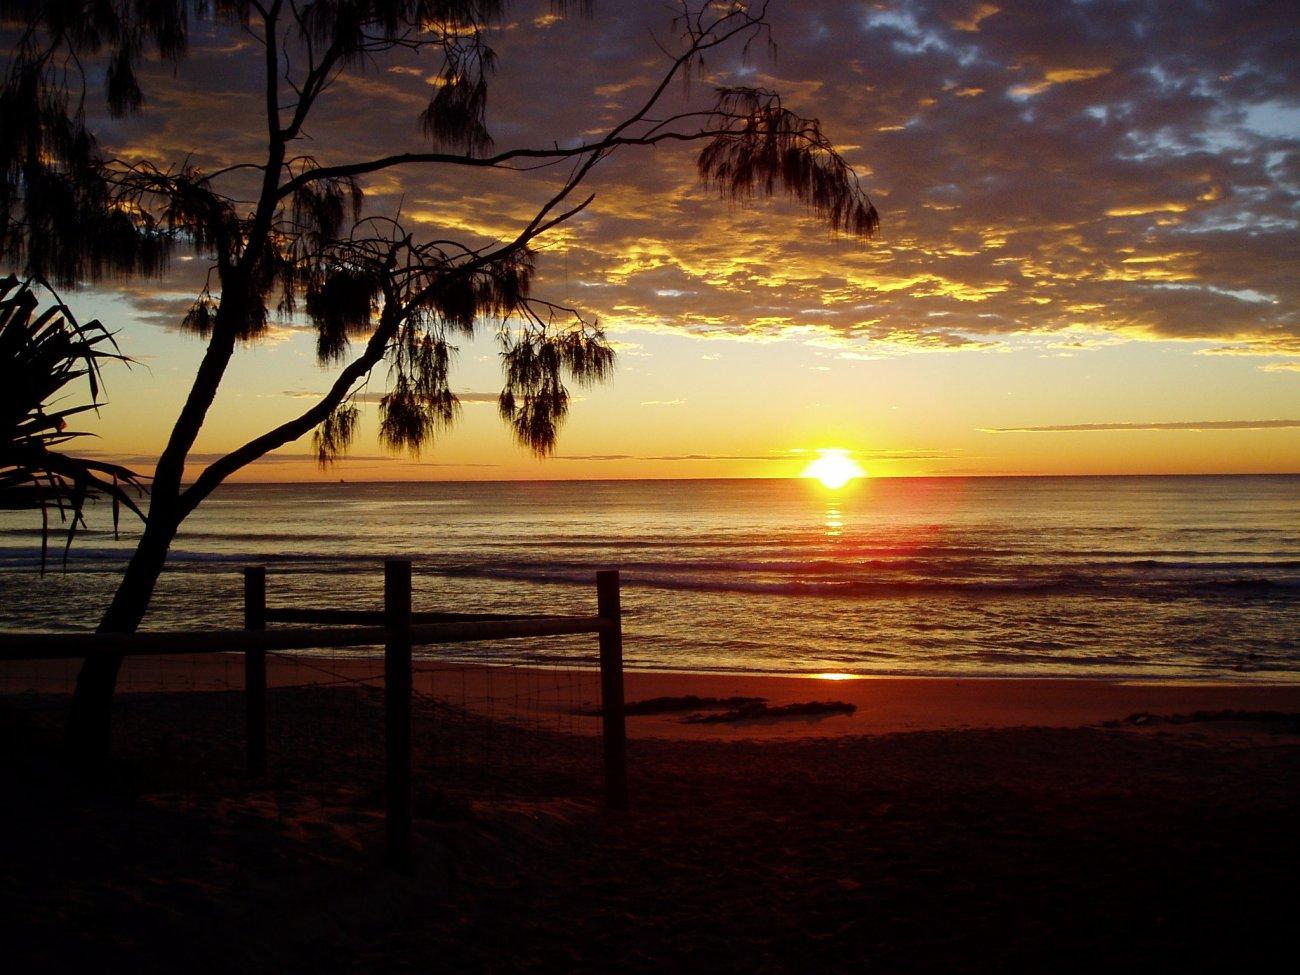 http://4.bp.blogspot.com/-Kj_EMILOTZ0/UC1TymZOA4I/AAAAAAAAAtM/2xBkXhbifpk/s1600/sunrise_sunshine_coast_australia.jpg